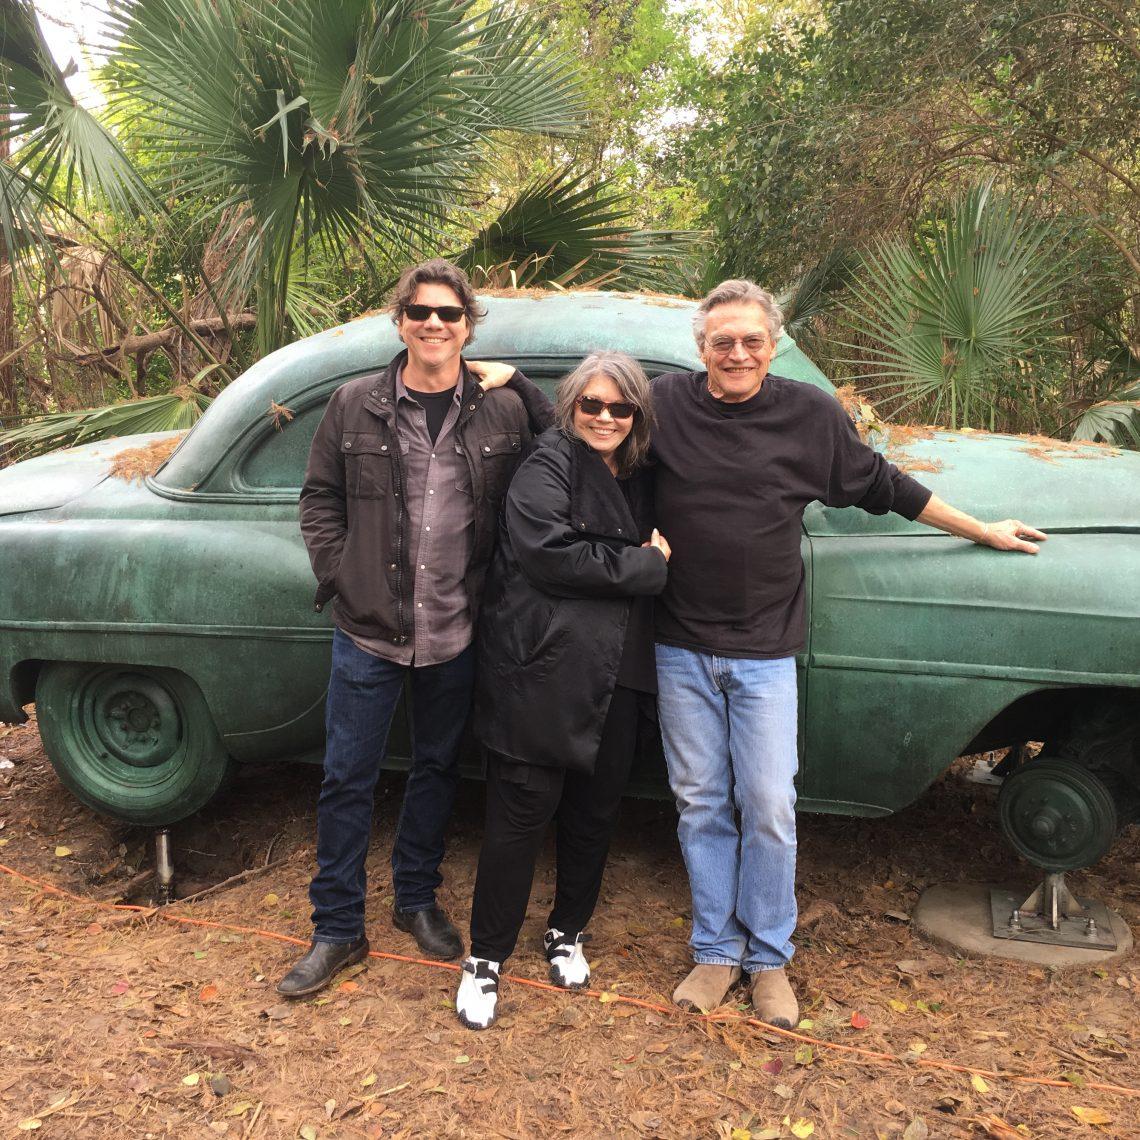 Family Car Trip: Terry Allen (right) with wife Jo Harvey and son Bukka Allen at Laguna Gloria in Austin. (Photo by Richard Skanse)